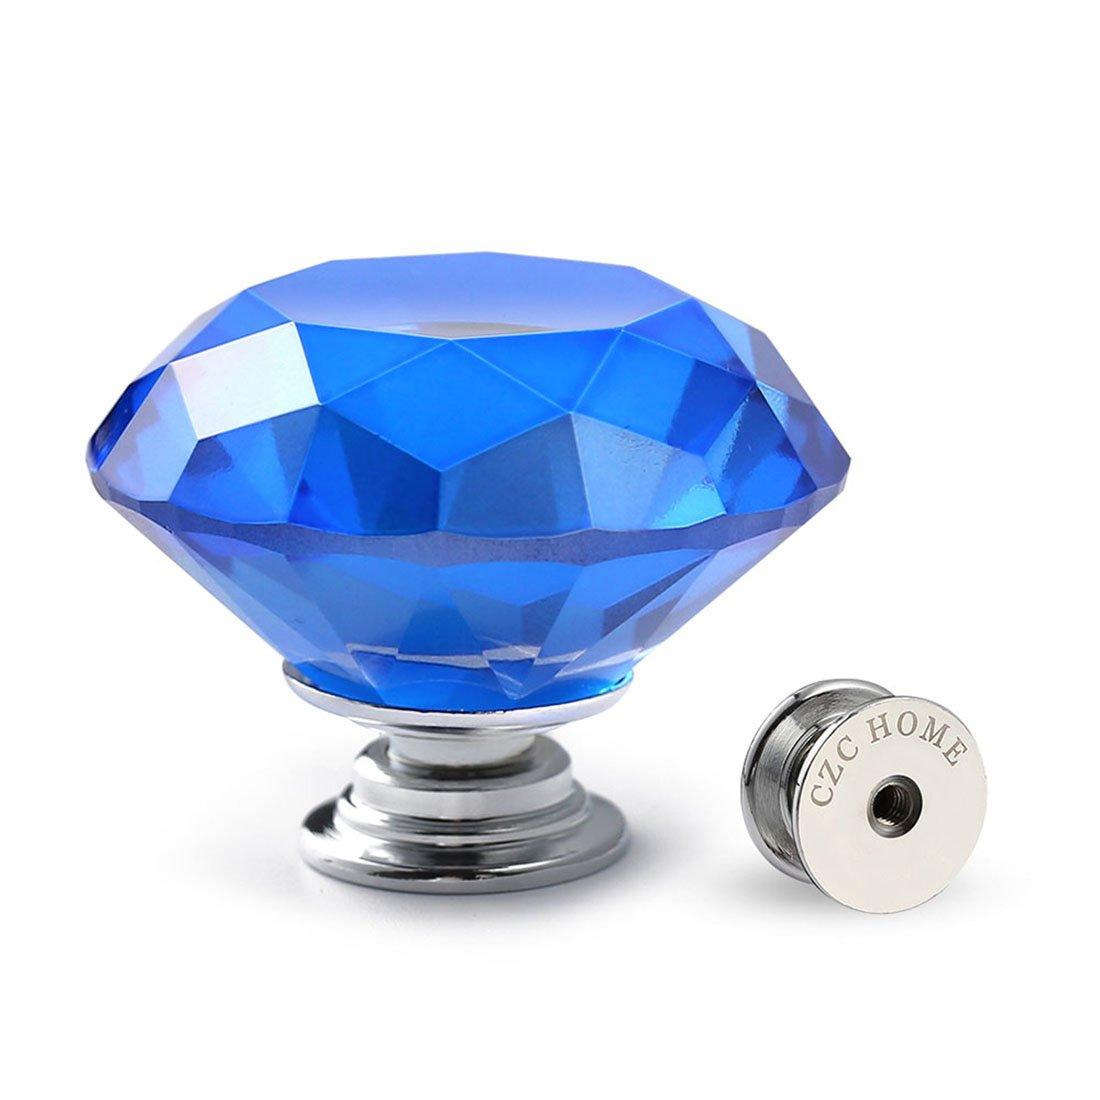 CZC Home 10 PCS Diamond Crystal Glass Pull Handle Cabinet Knobs Cupboard Drawers Cabinet Dresser Bookcase Wardrobe (40mm, Dark Blue)